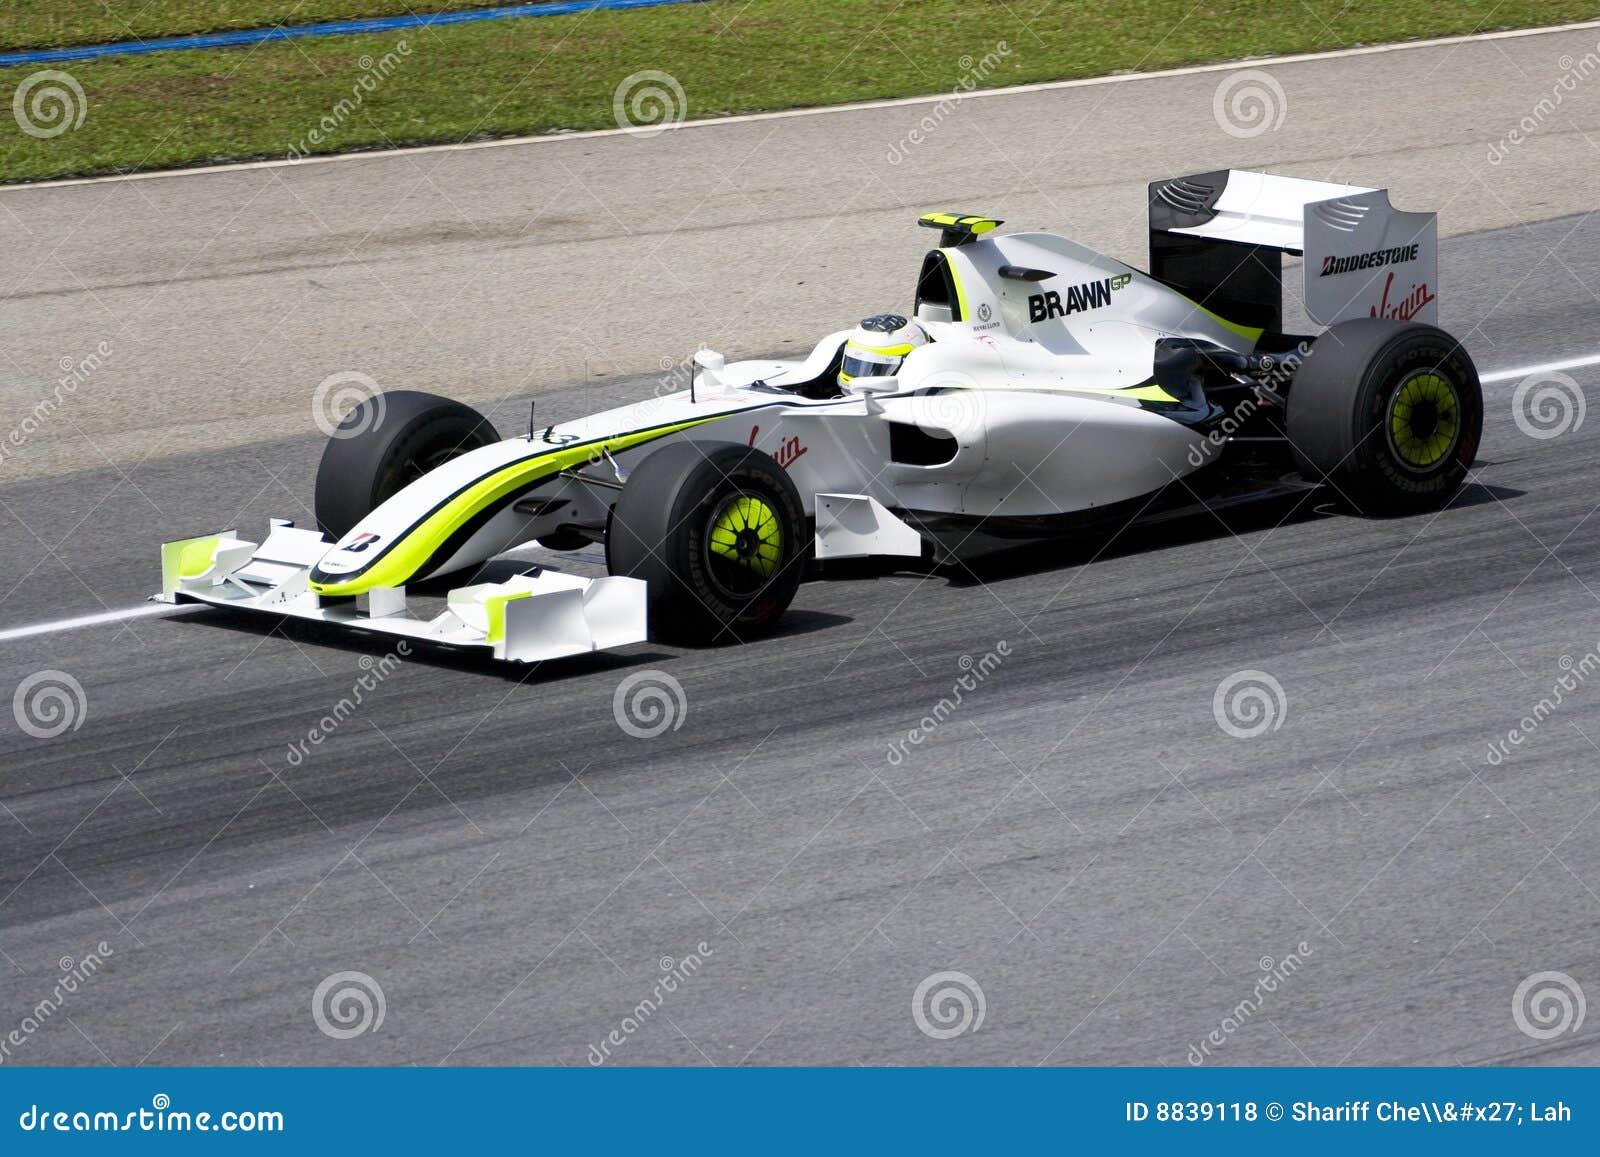 F1 Rennend 2009 - Rubens Barrichello (GP Hoofdkaas)